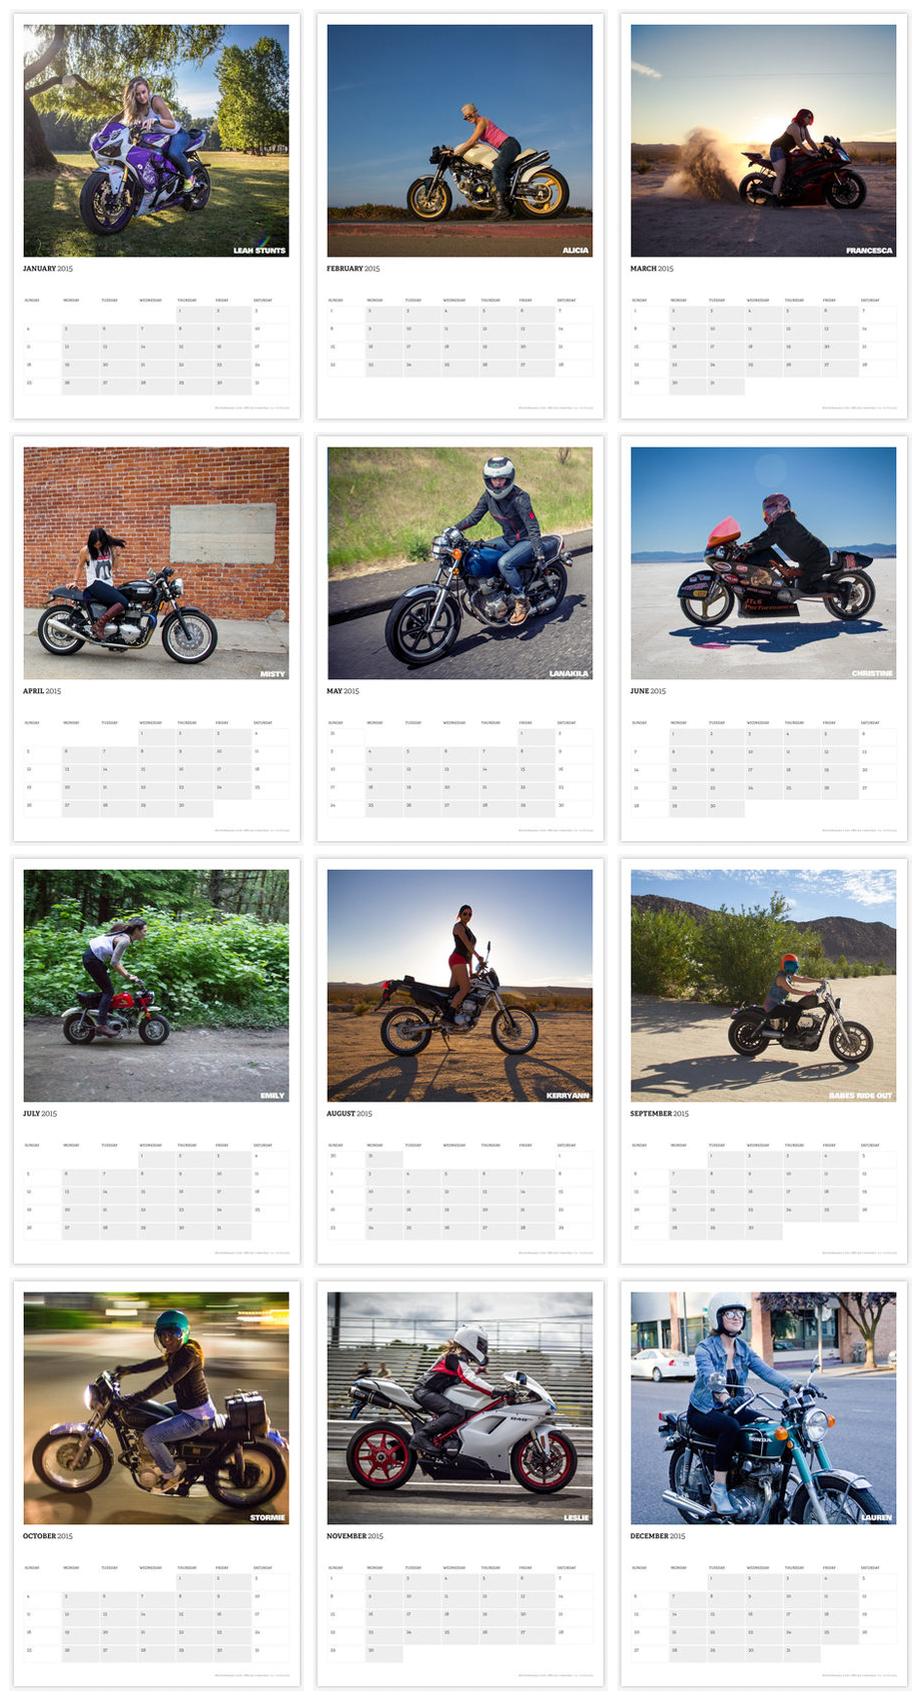 motolady-calendar-months